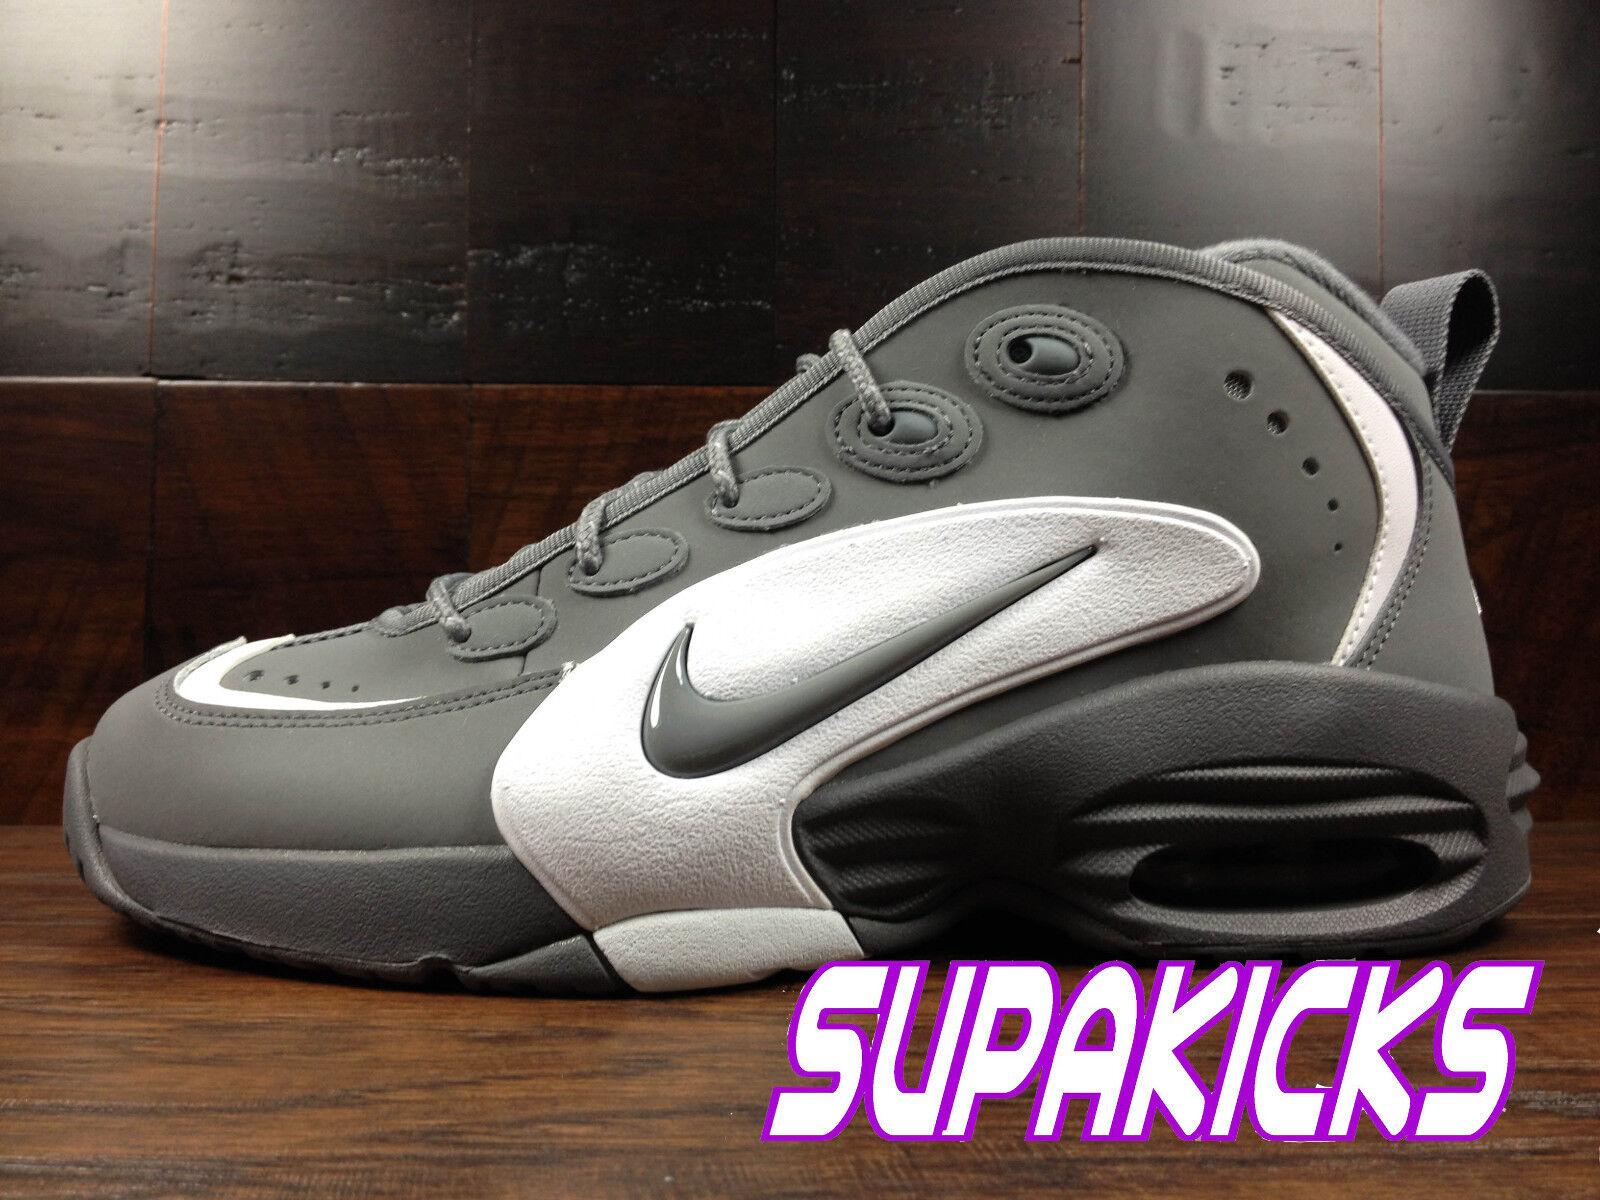 Nike Air Way Up Pippen Rodman (Cool Grey / White) NSW [579945-001] Mens 8-13